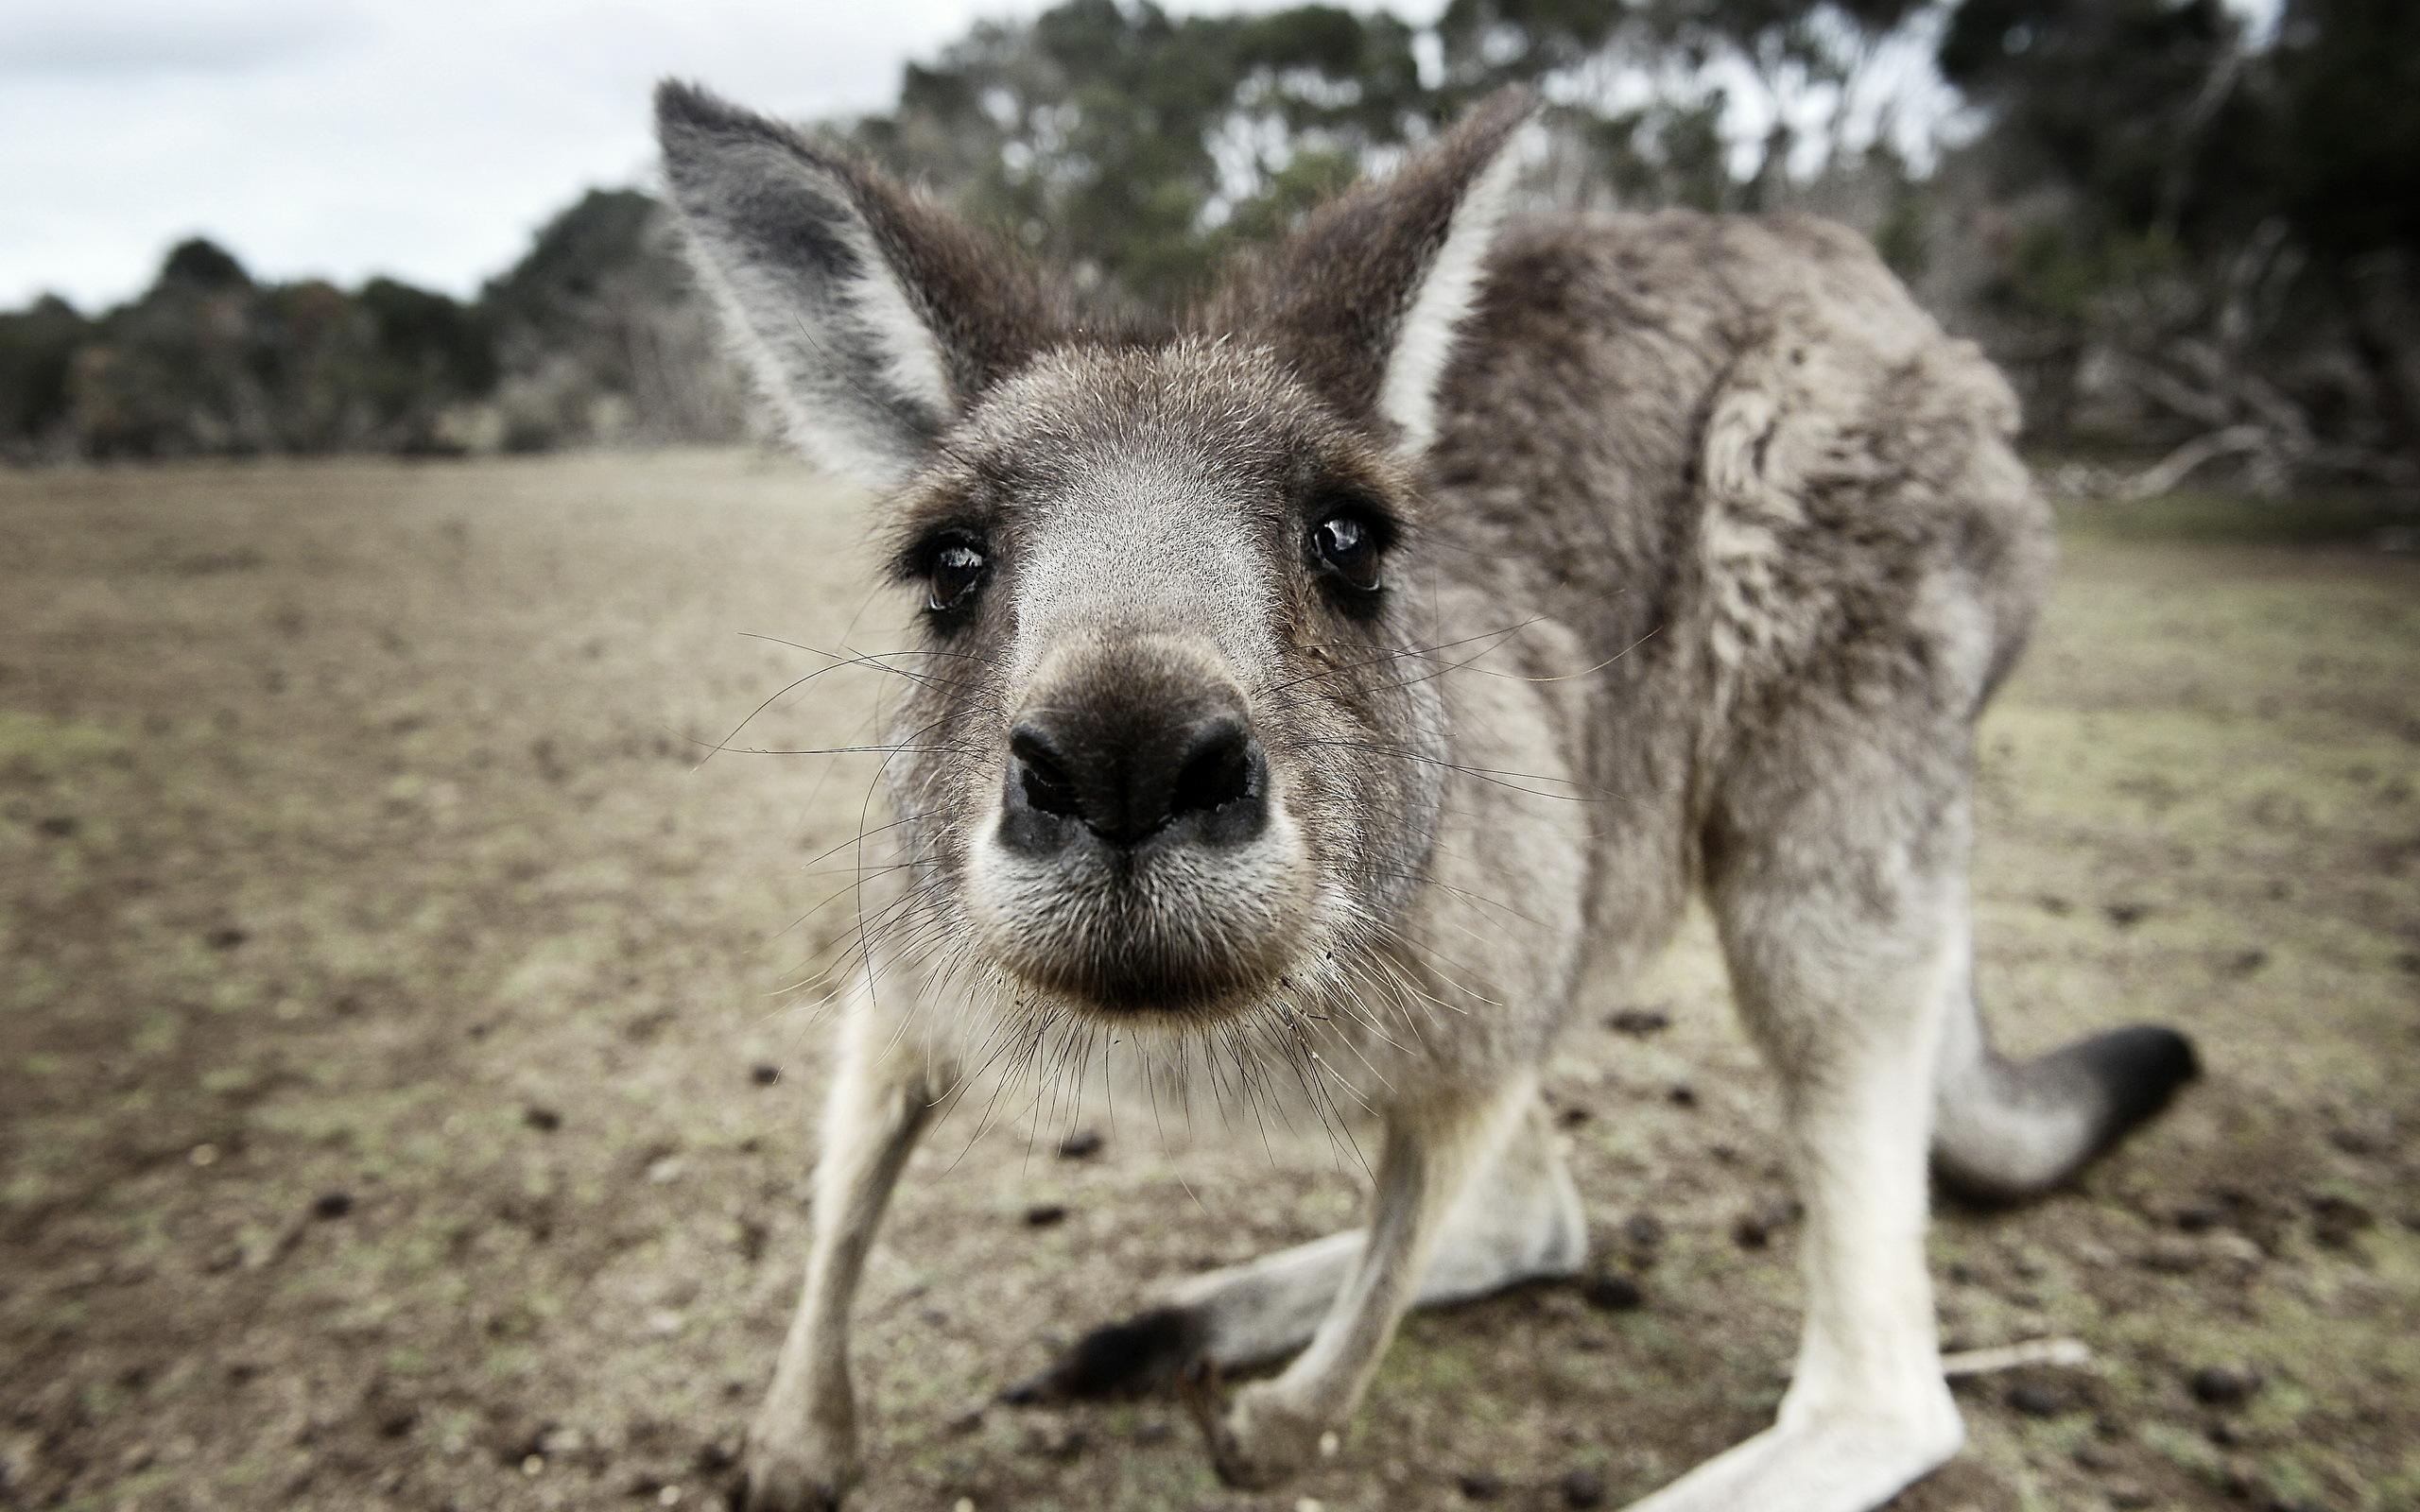 Kangaroo Wallpapers Top Free Kangaroo Backgrounds